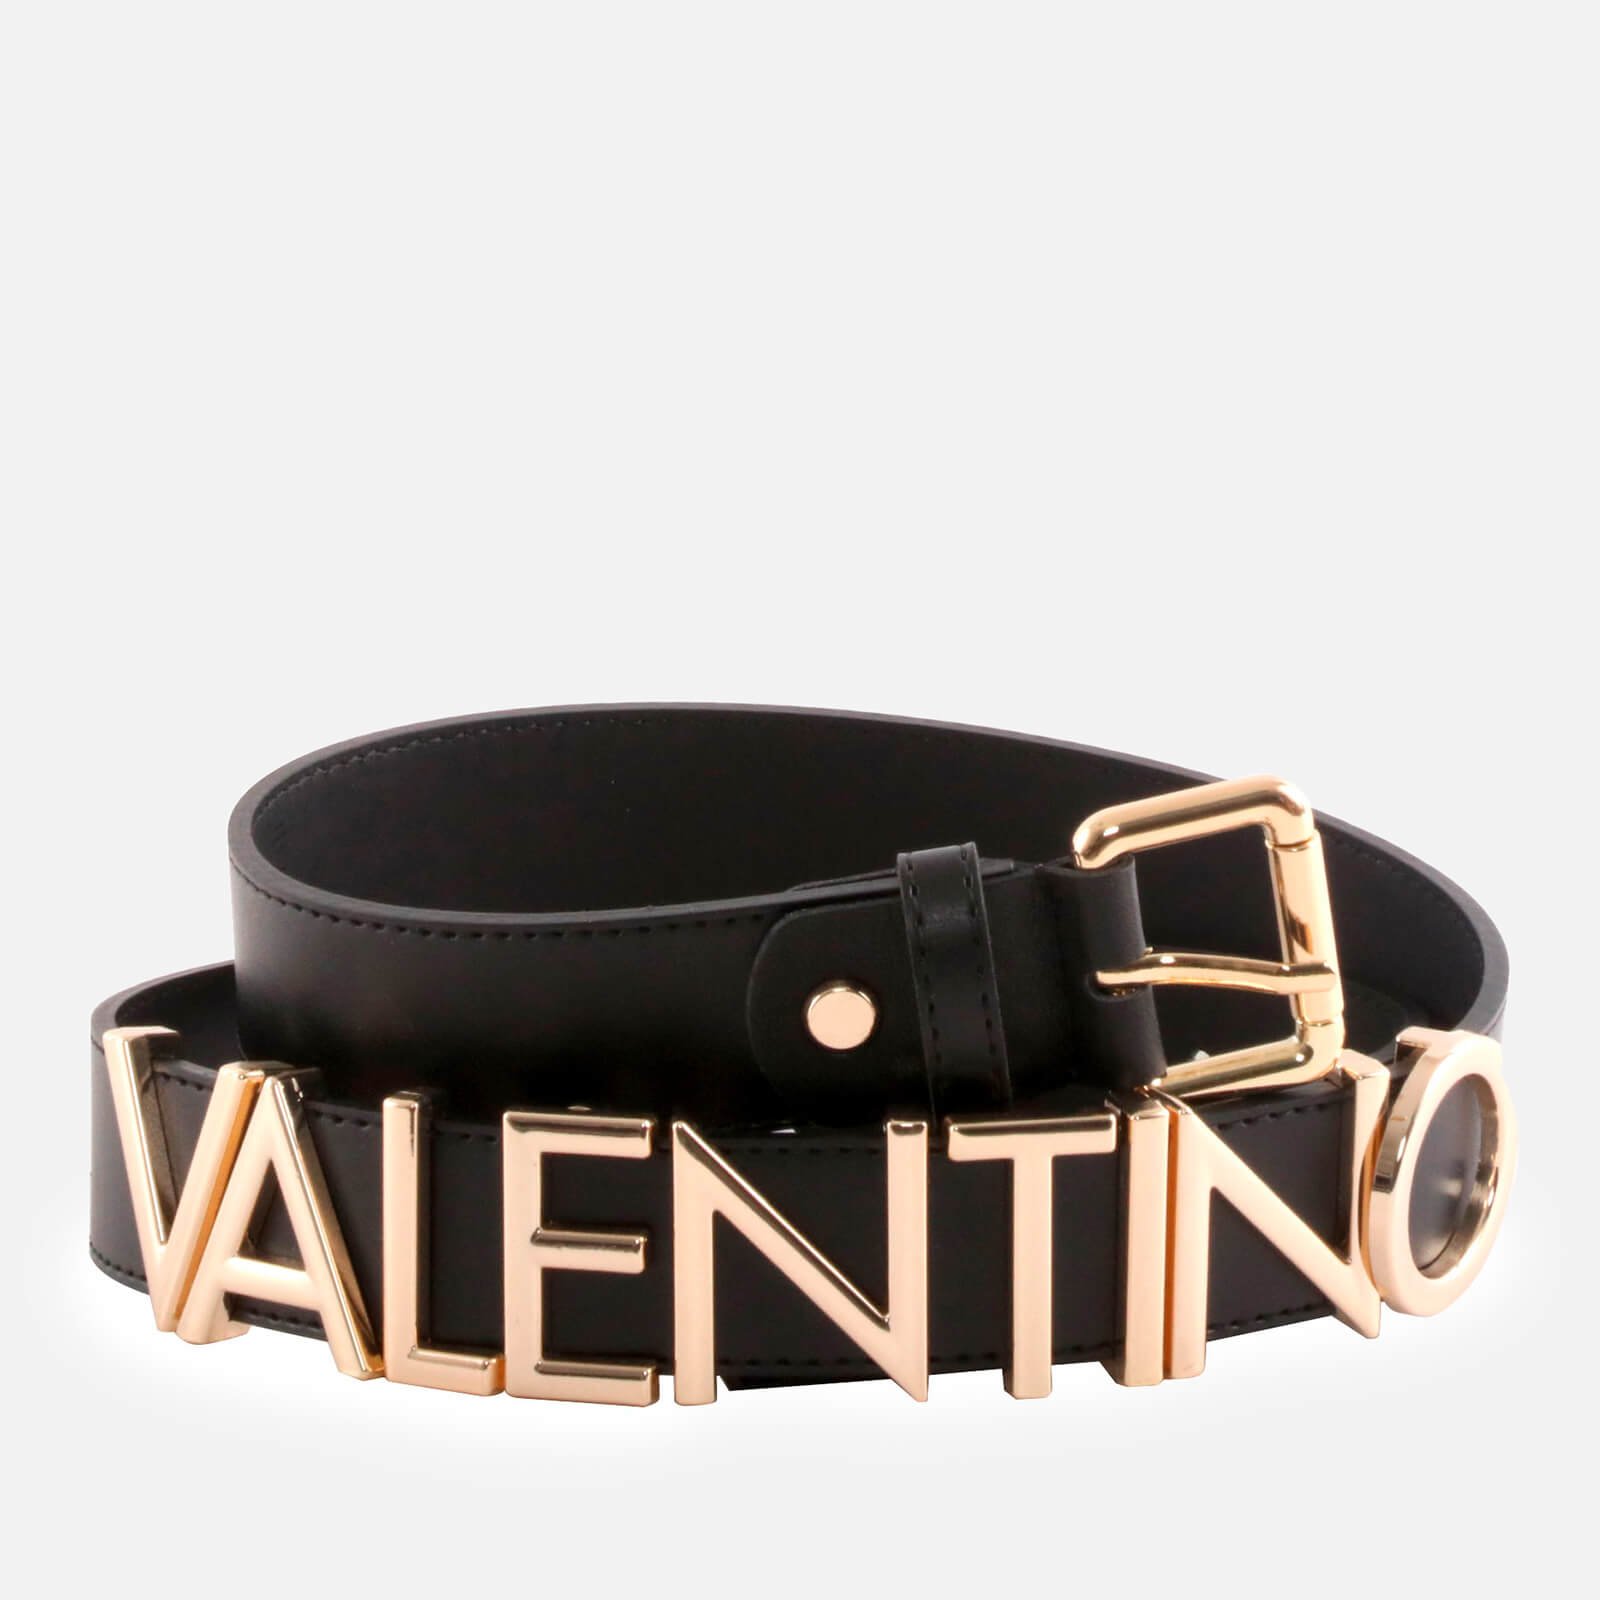 Valentino Bags Women's Emma Winter Belt - Black - S